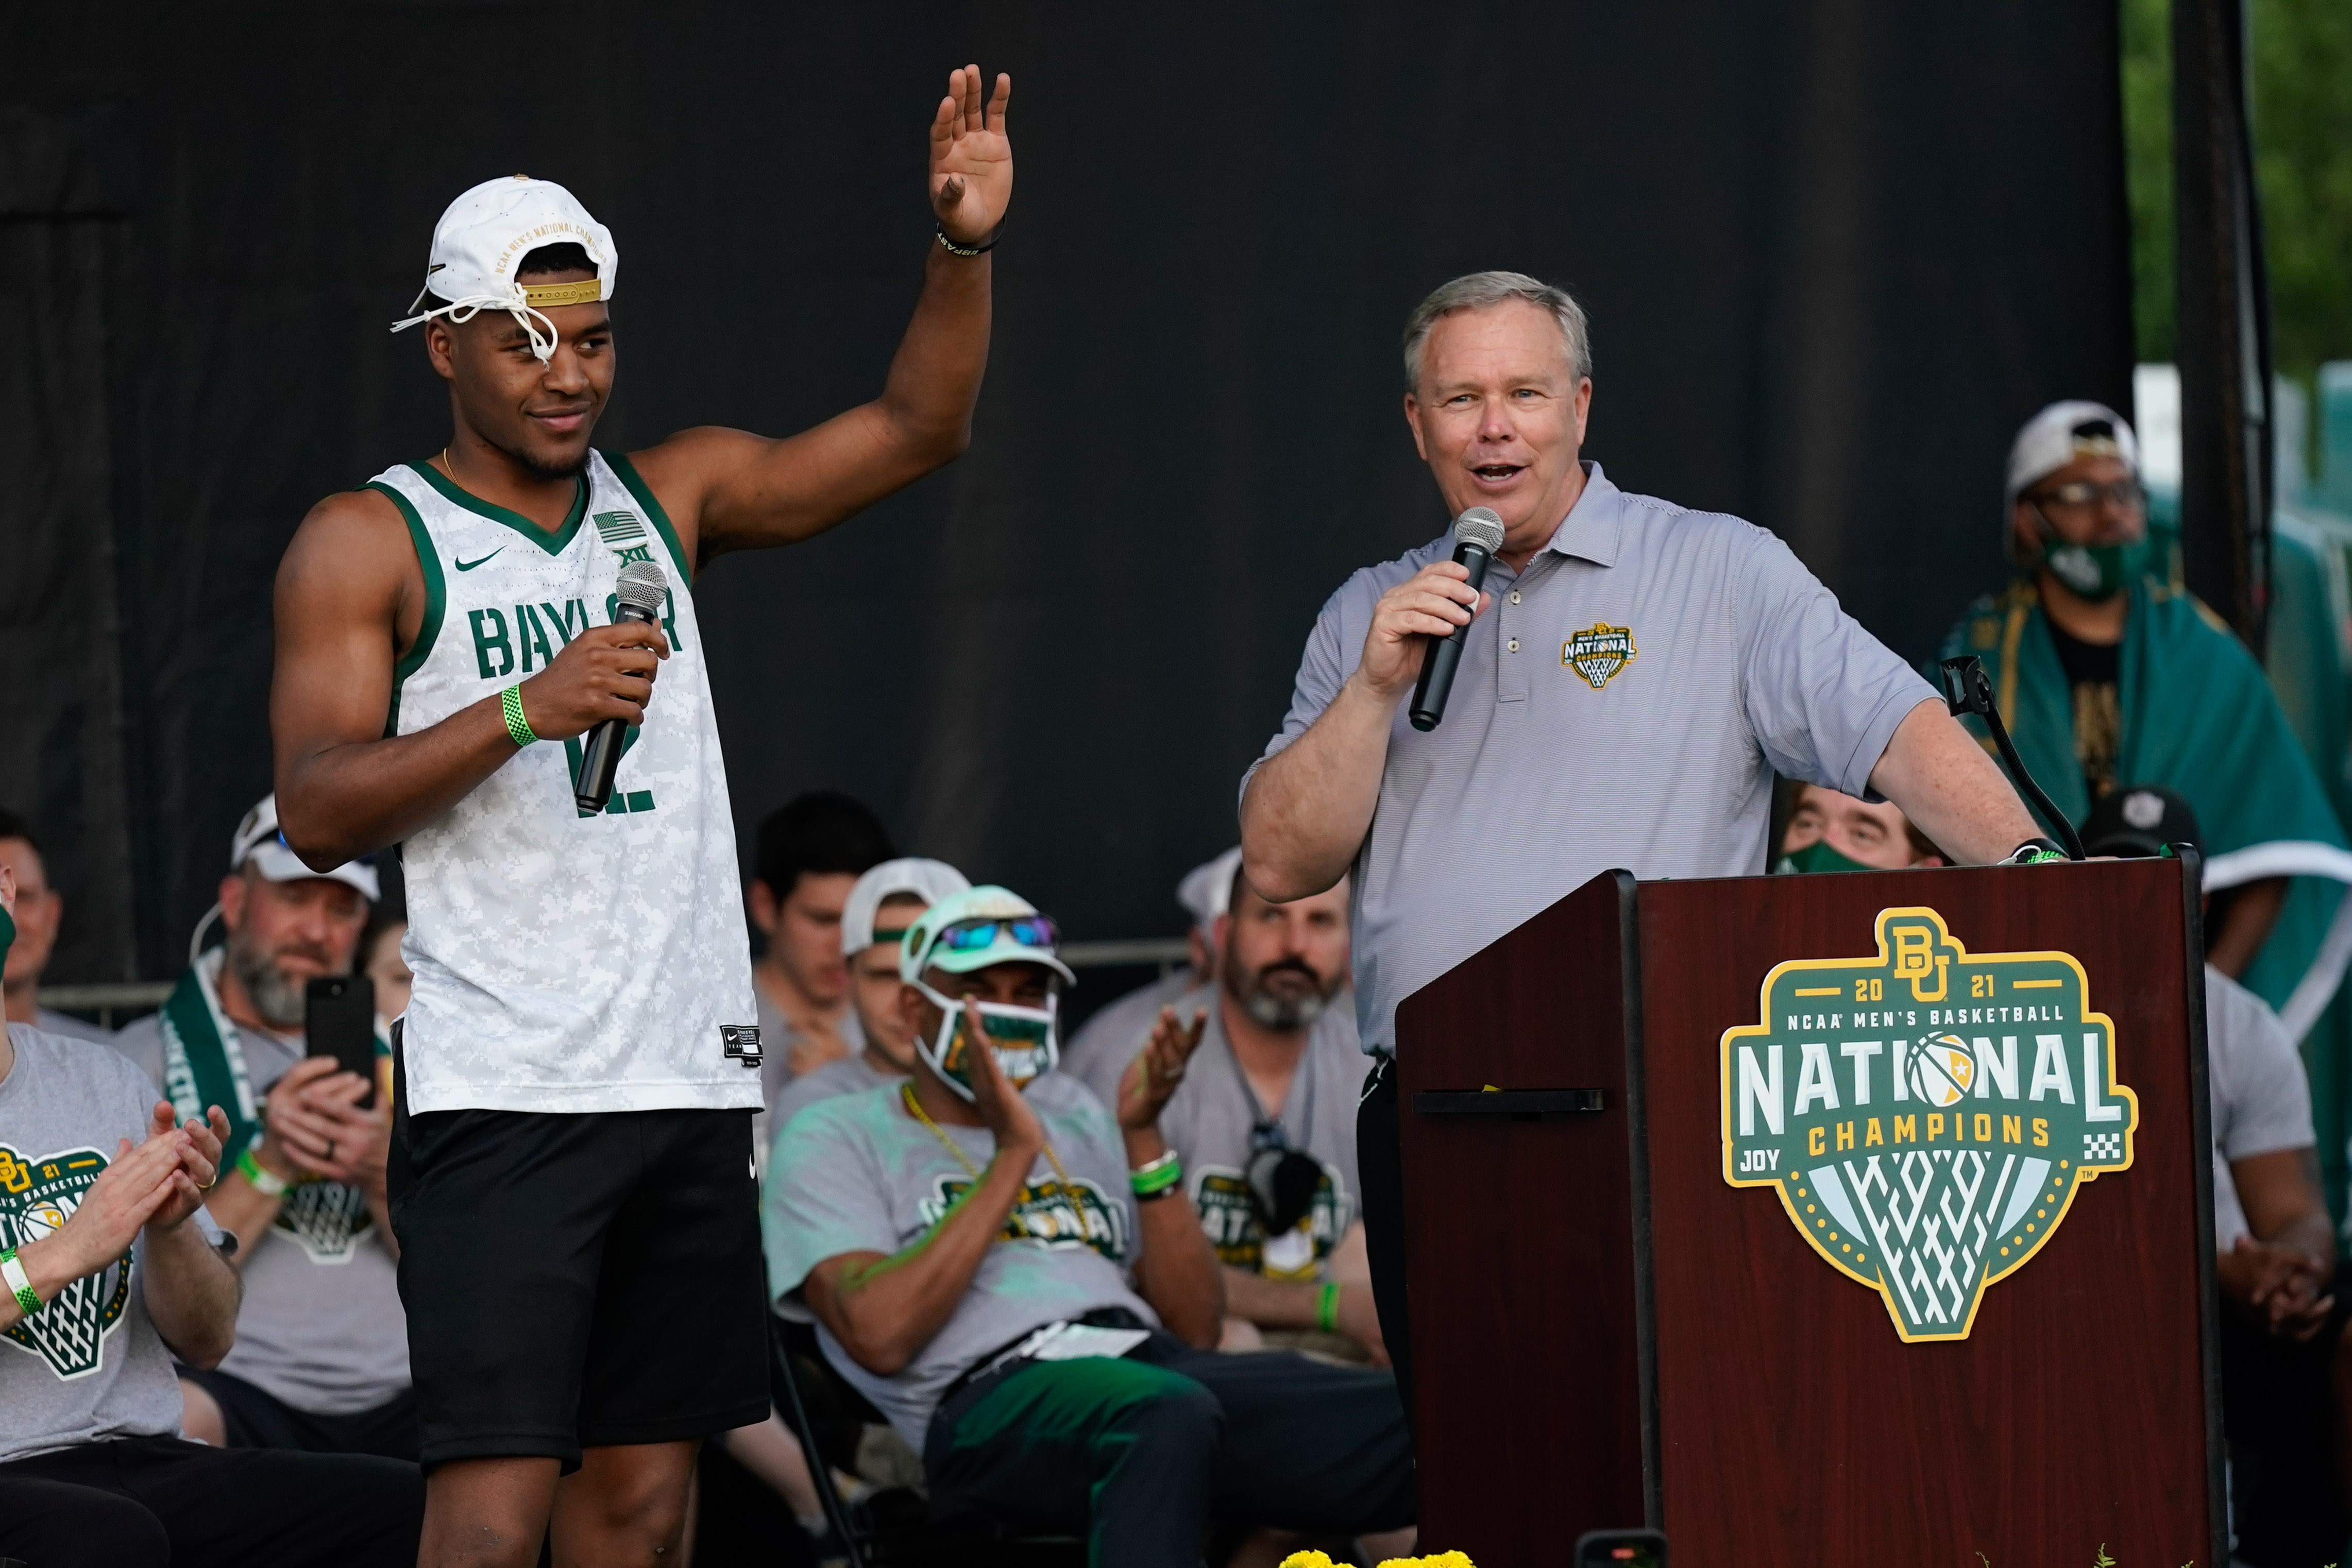 NCAA Basketball: Final Four Champions-Baylor Celebration